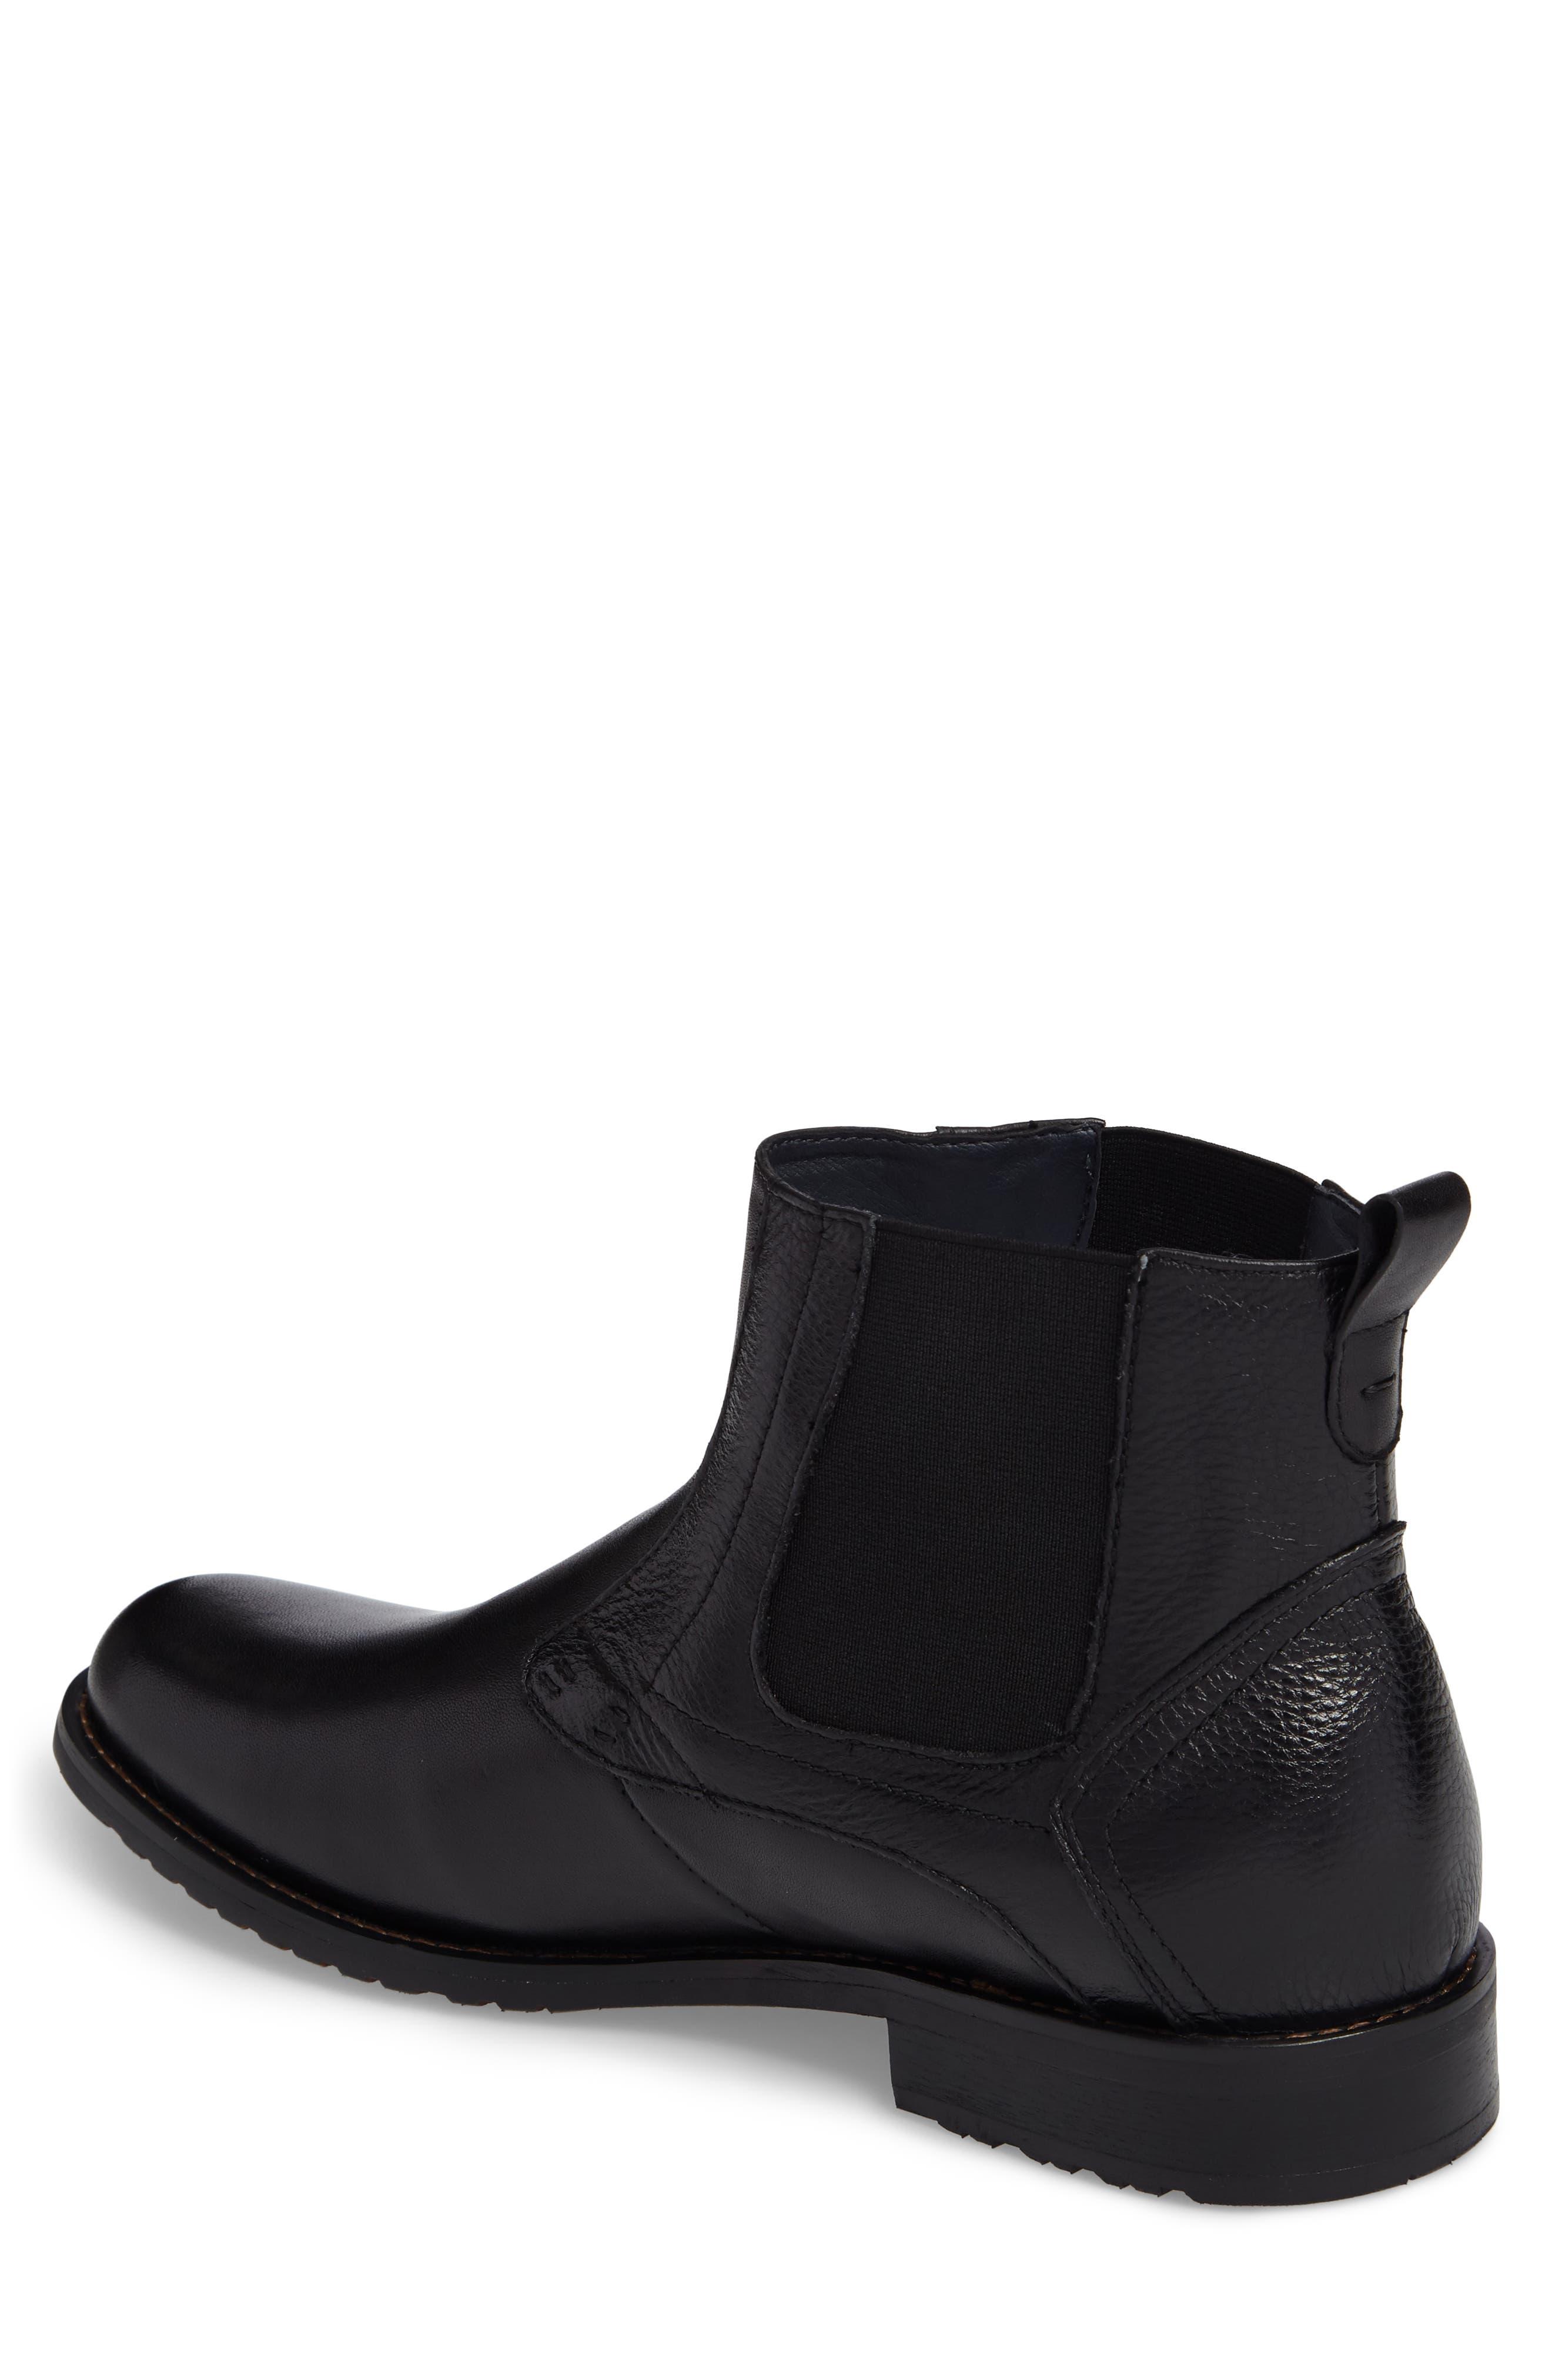 Oaks Chelsea Boot,                             Alternate thumbnail 2, color,                             Black Leather